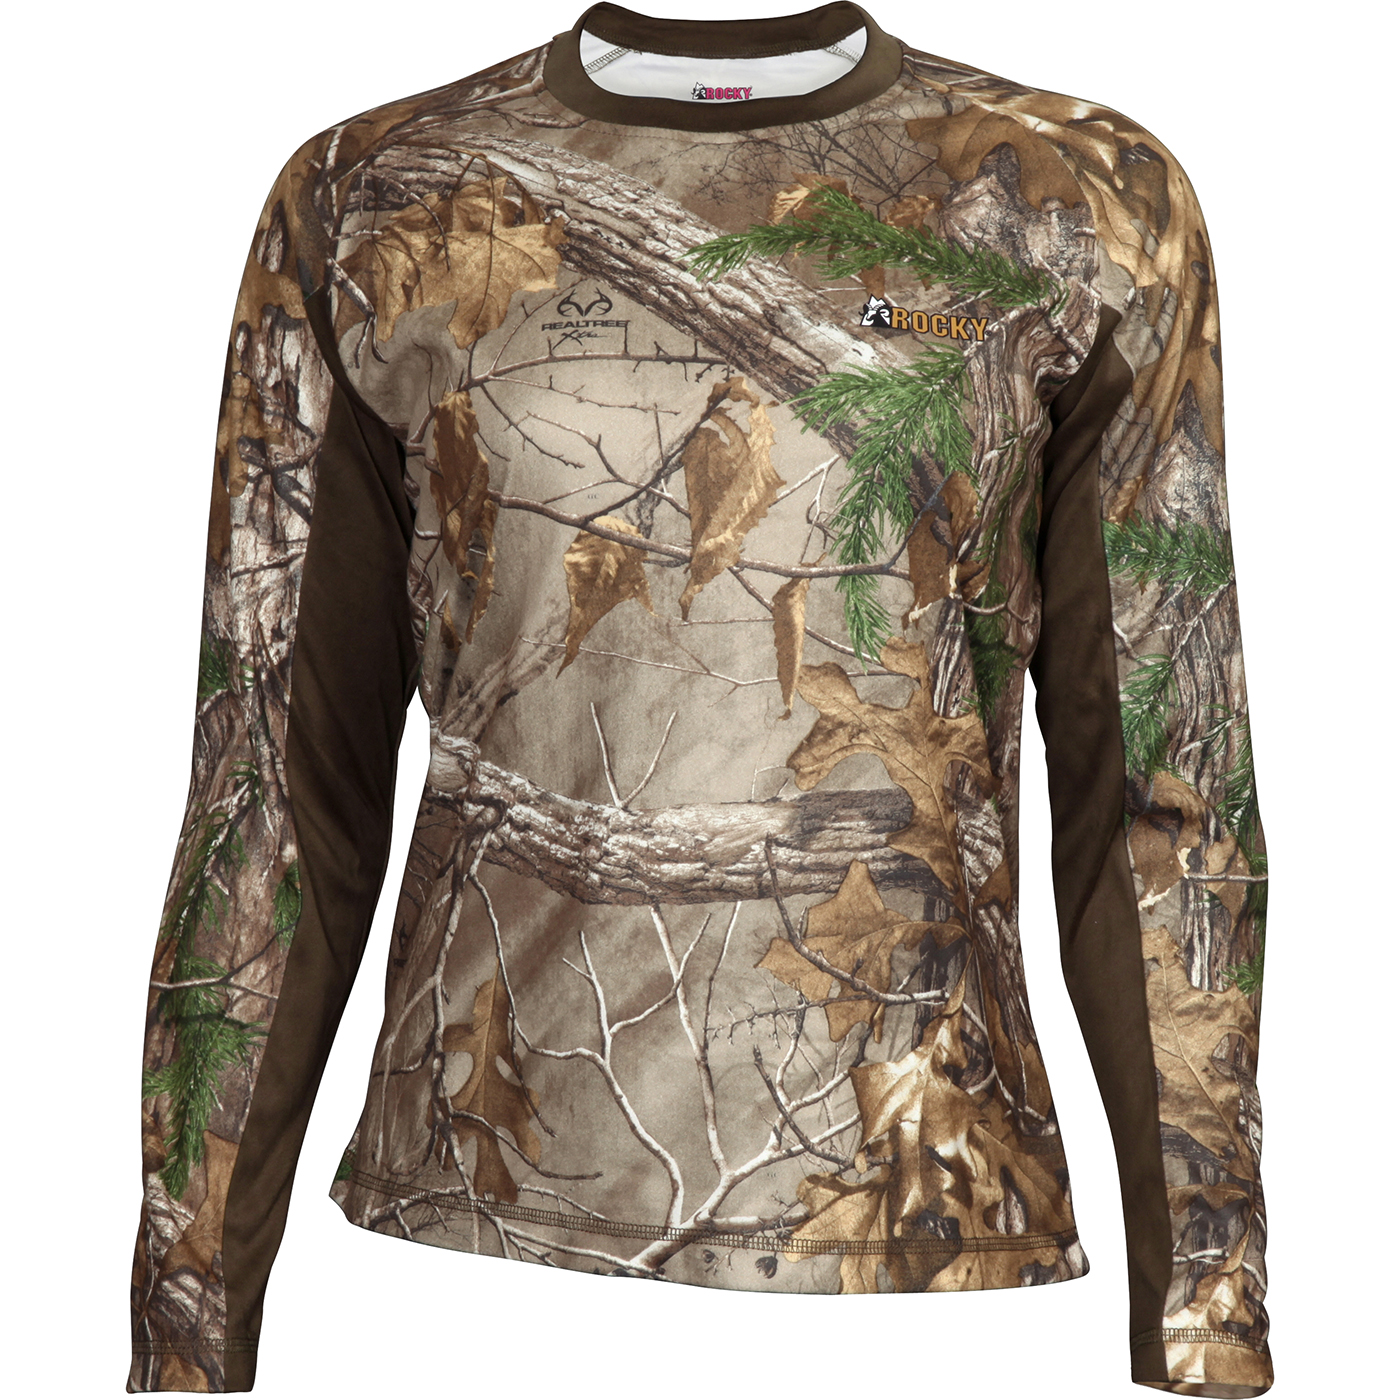 f1031f7b38350 Rocky Women's SilentHunter Scent Control 1/4 Zip Long-Sleeve Shirt ...